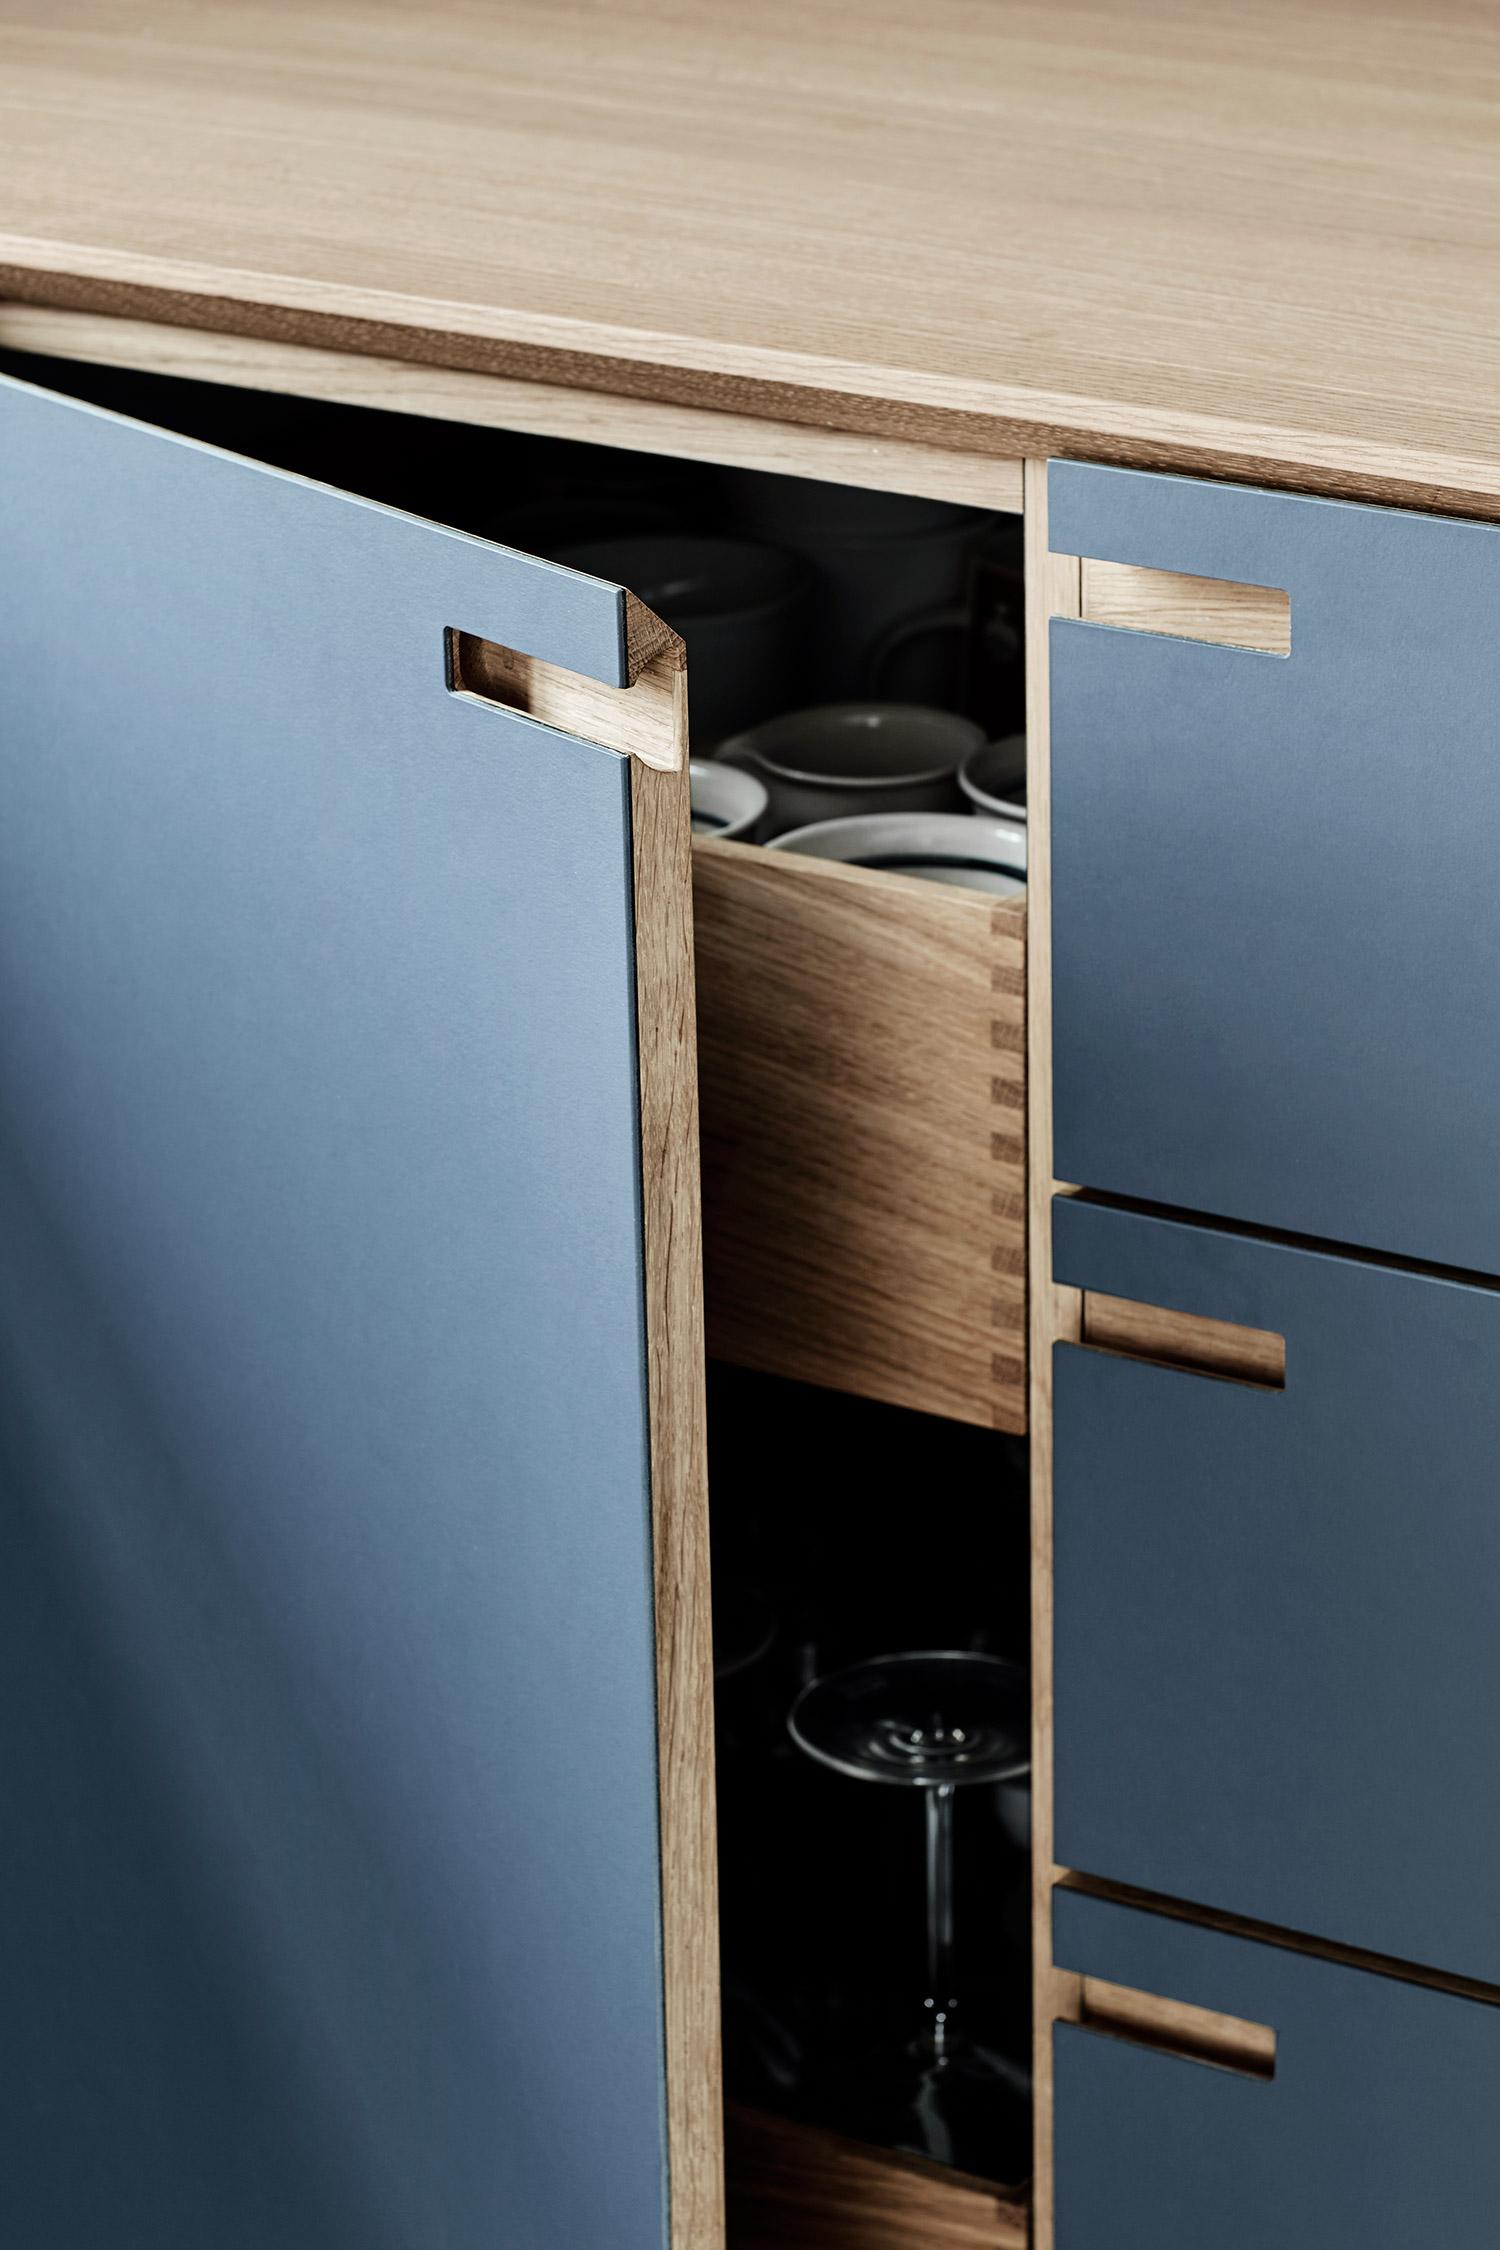 Danish minimalist kitchen design by Nicolaj Bo™